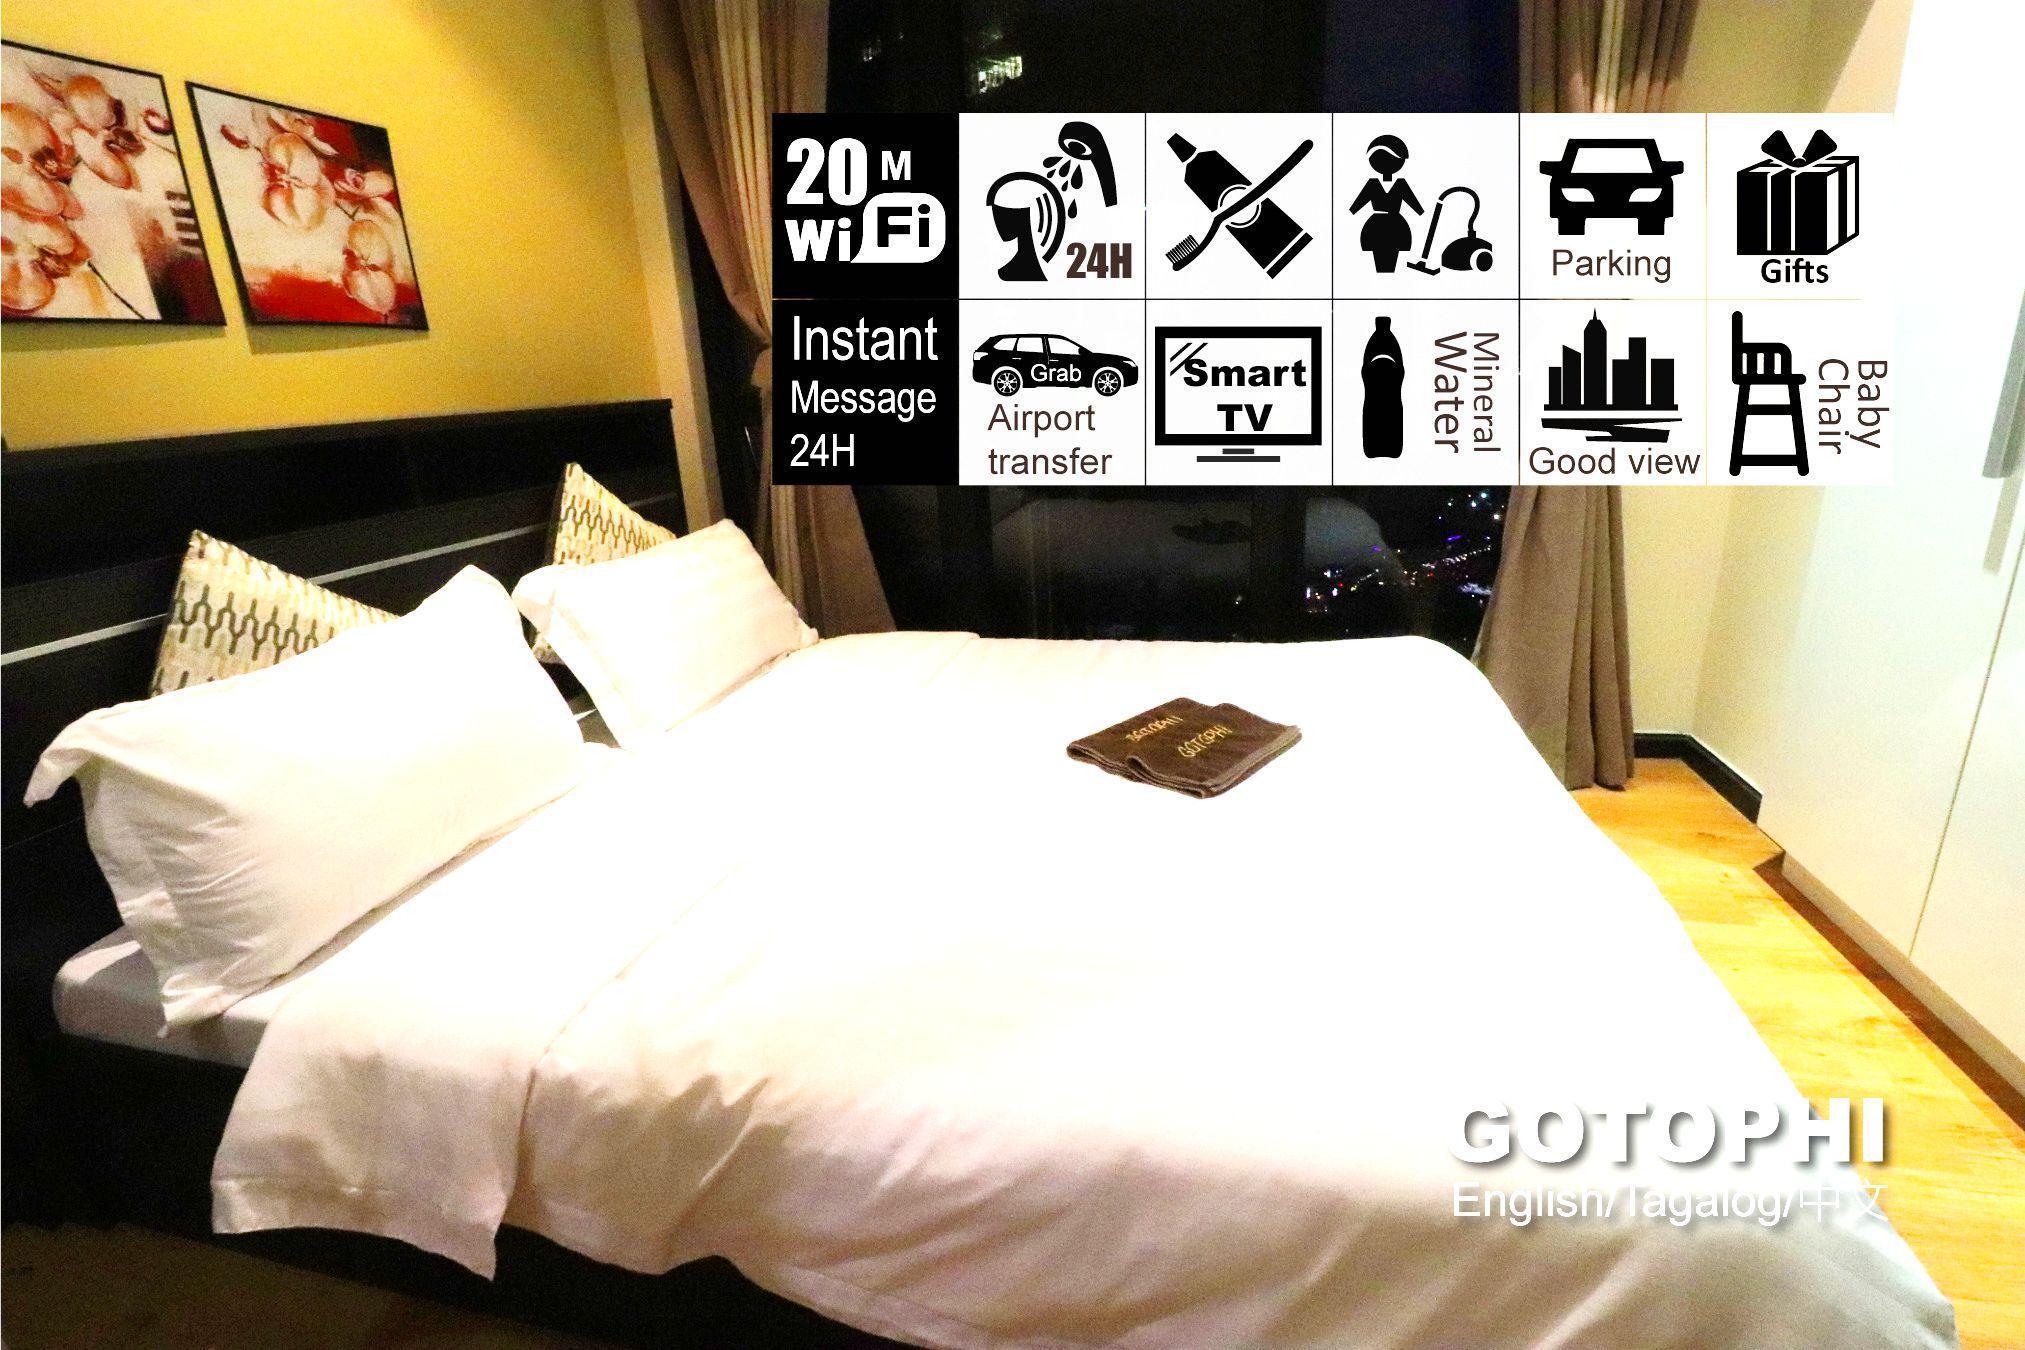 Gotophi Luxurious Hotel Knightsbridge Makati 4709